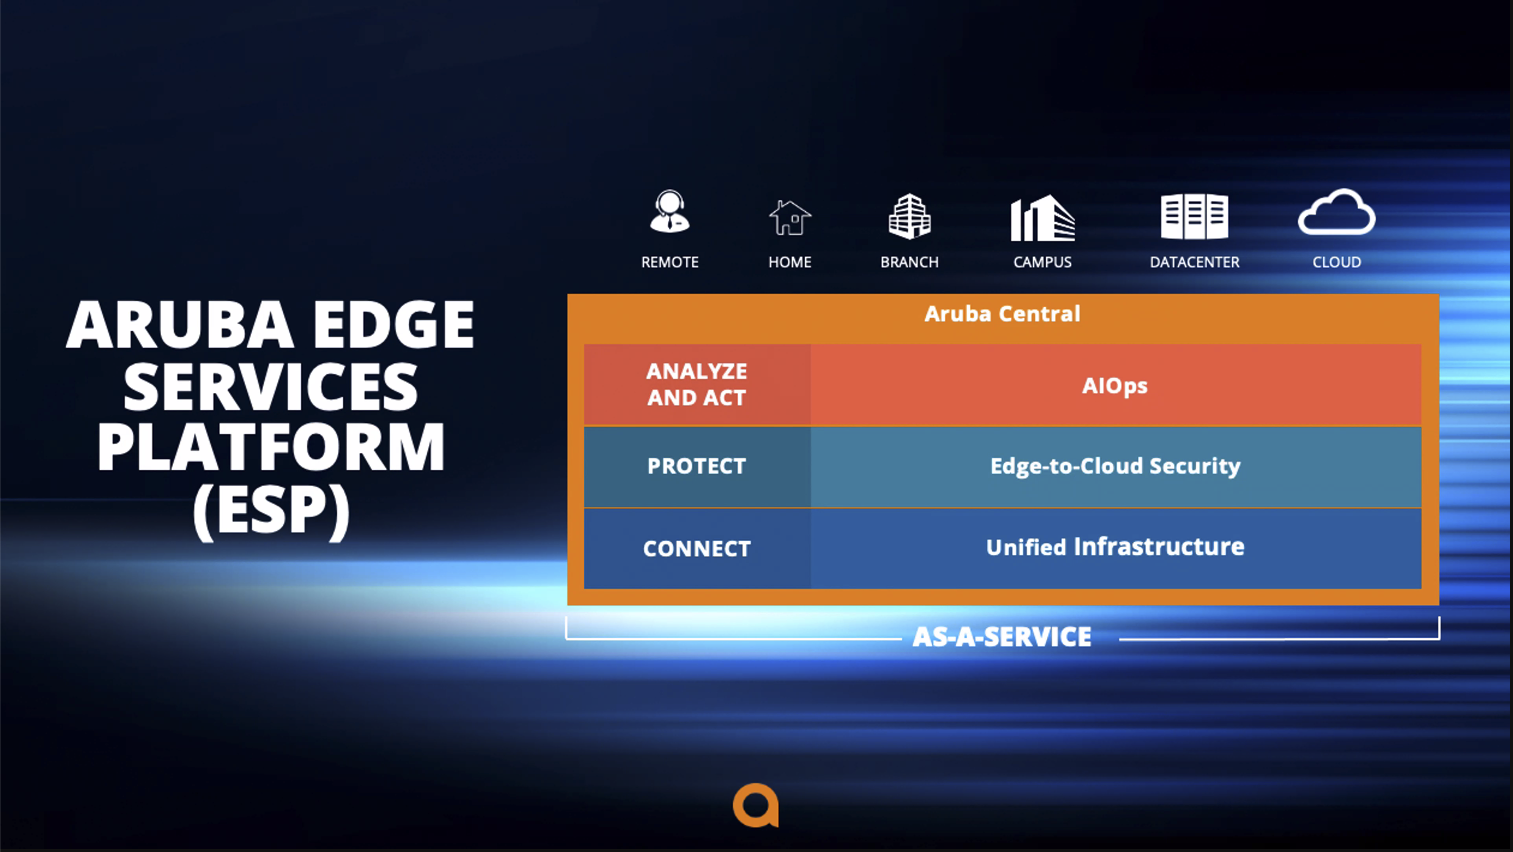 Aruba Edge Services Platform ESP